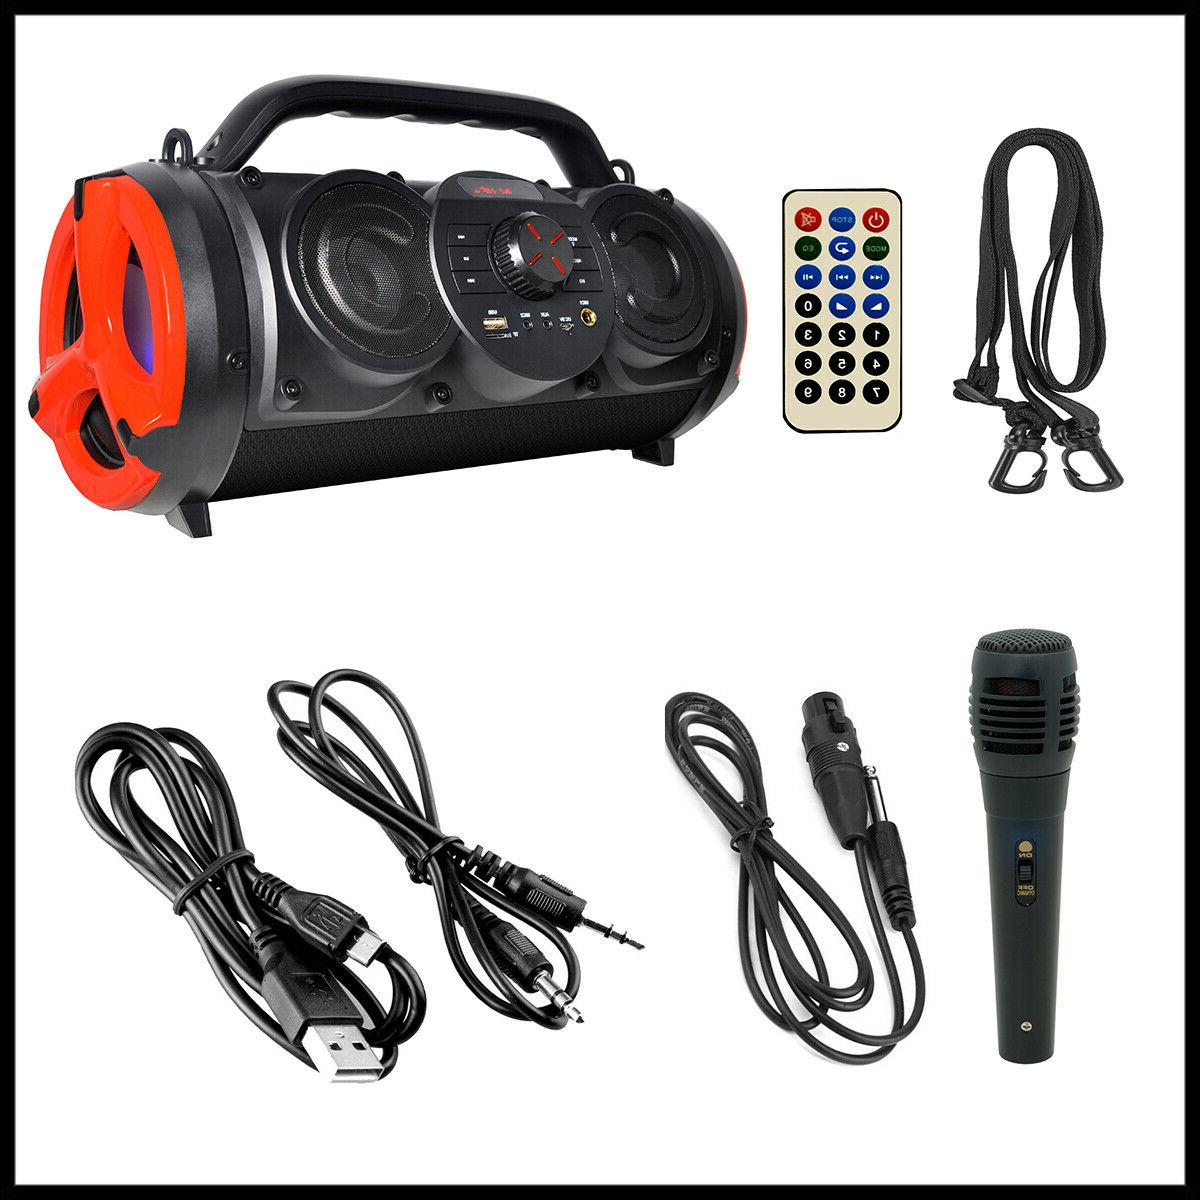 Boytone Portable Bluetooth Boombox Speaker, Indoor/Outdoor Hi-Fi